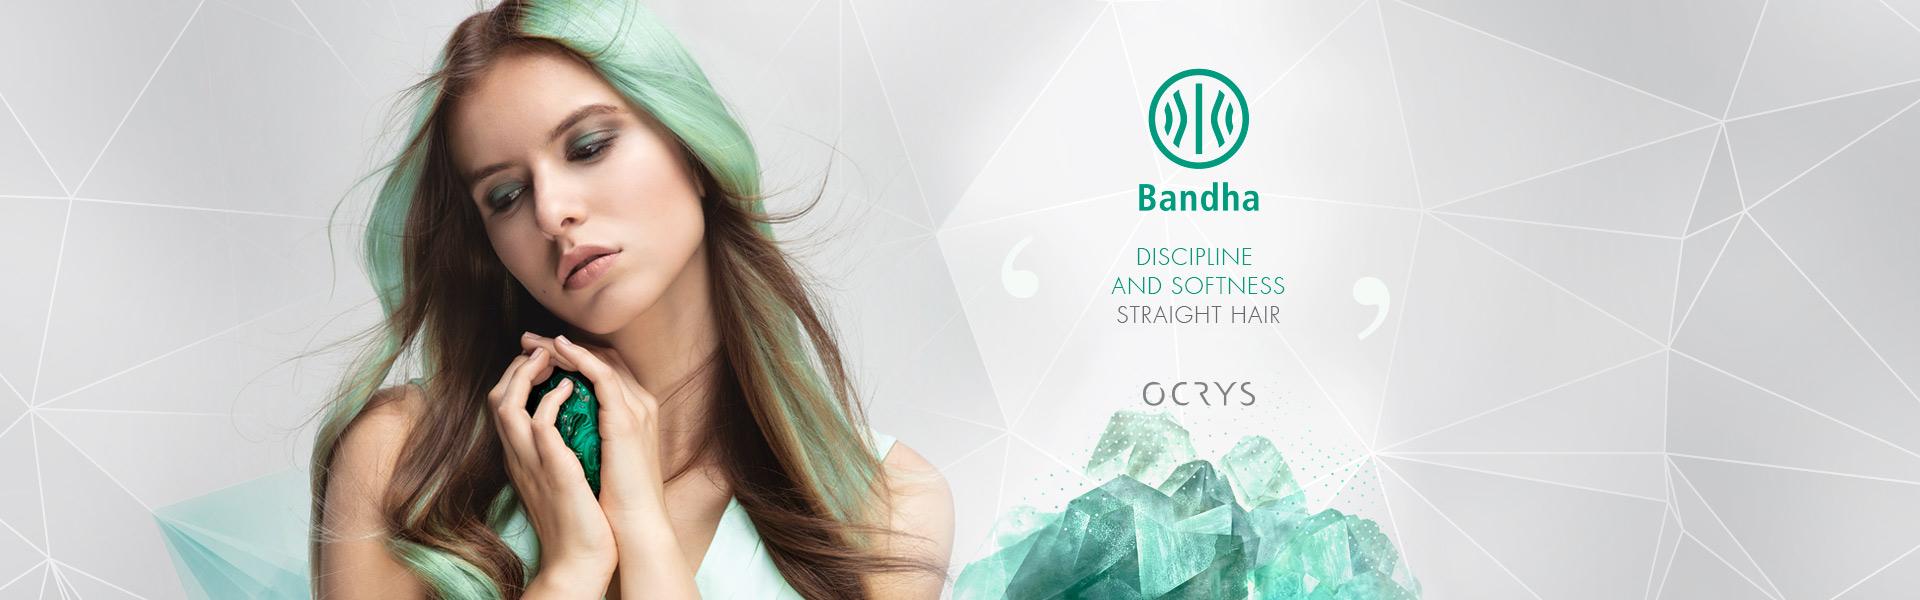 banner_centrali_OCRYS_BANDHA